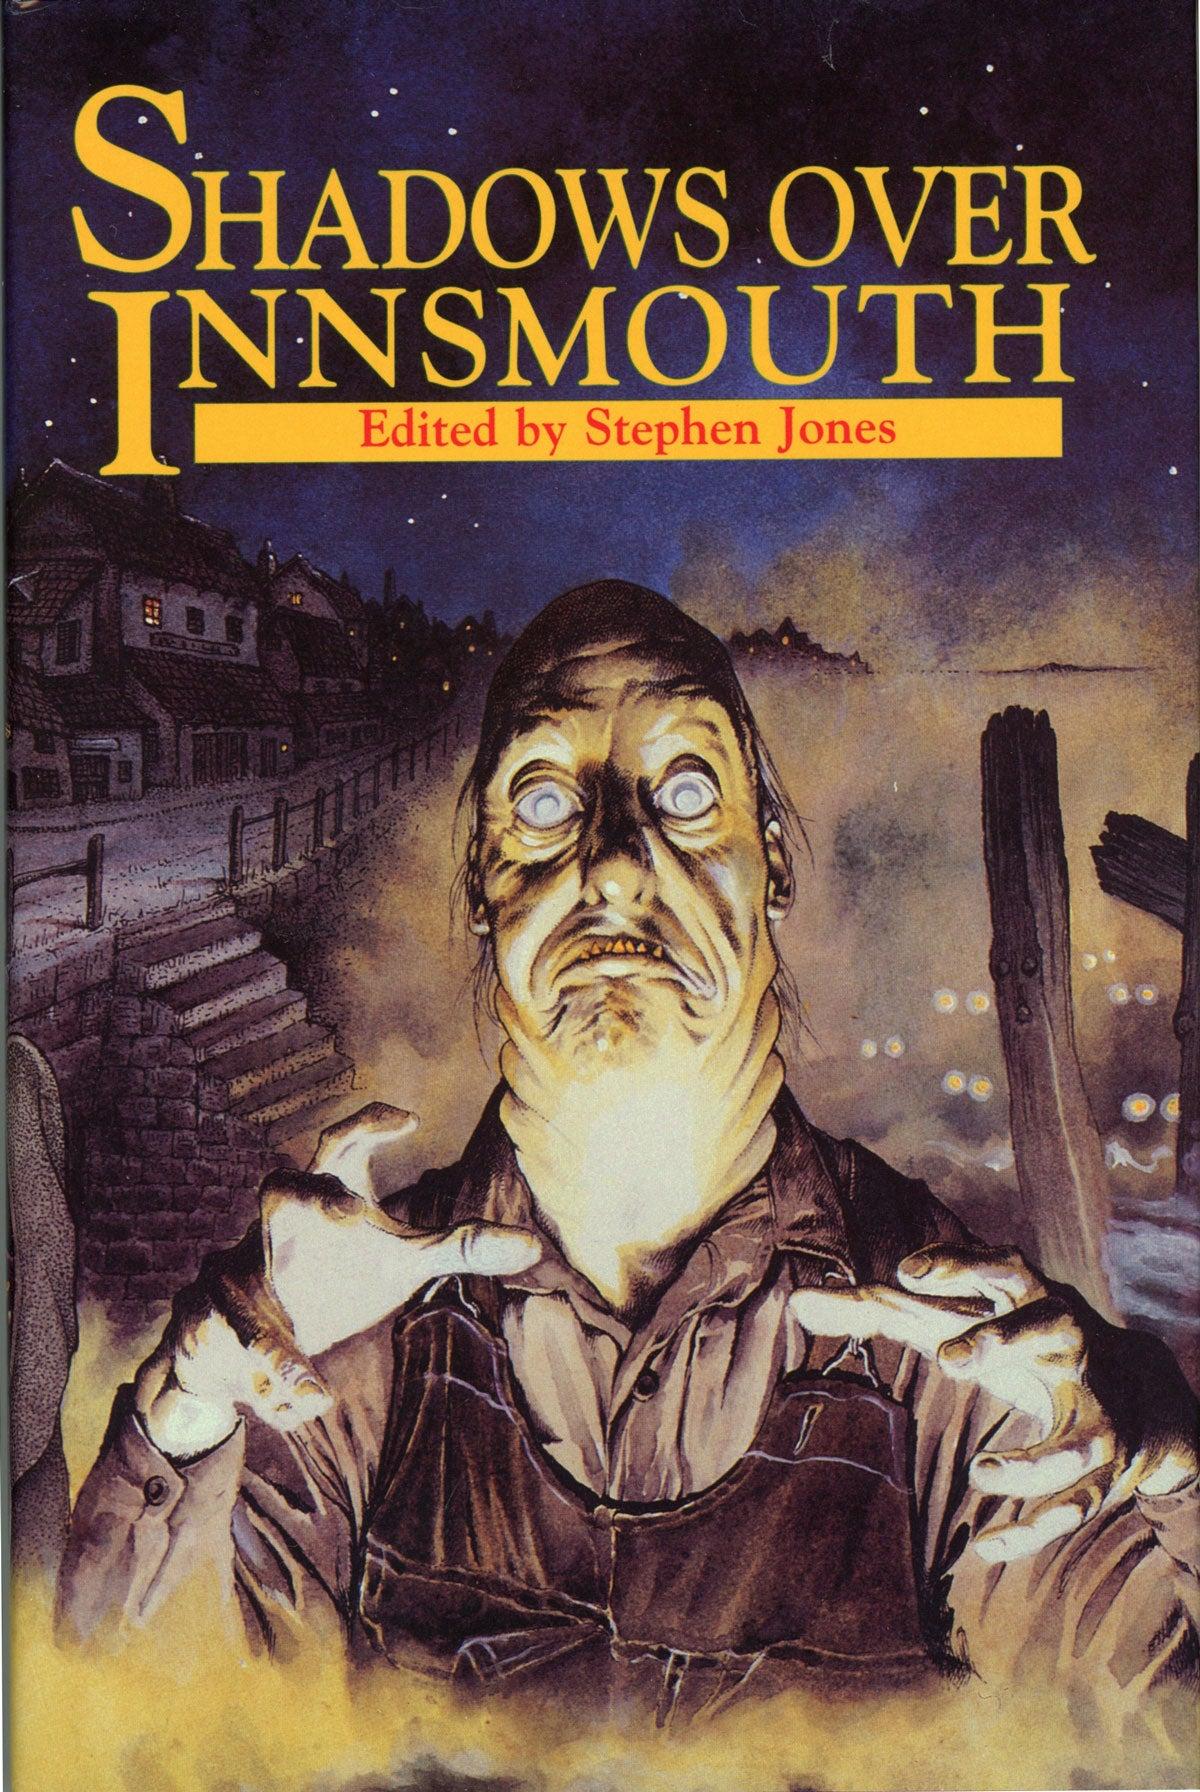 SHADOWS OVER INNSMOUTH  Stephen Jones  First edition